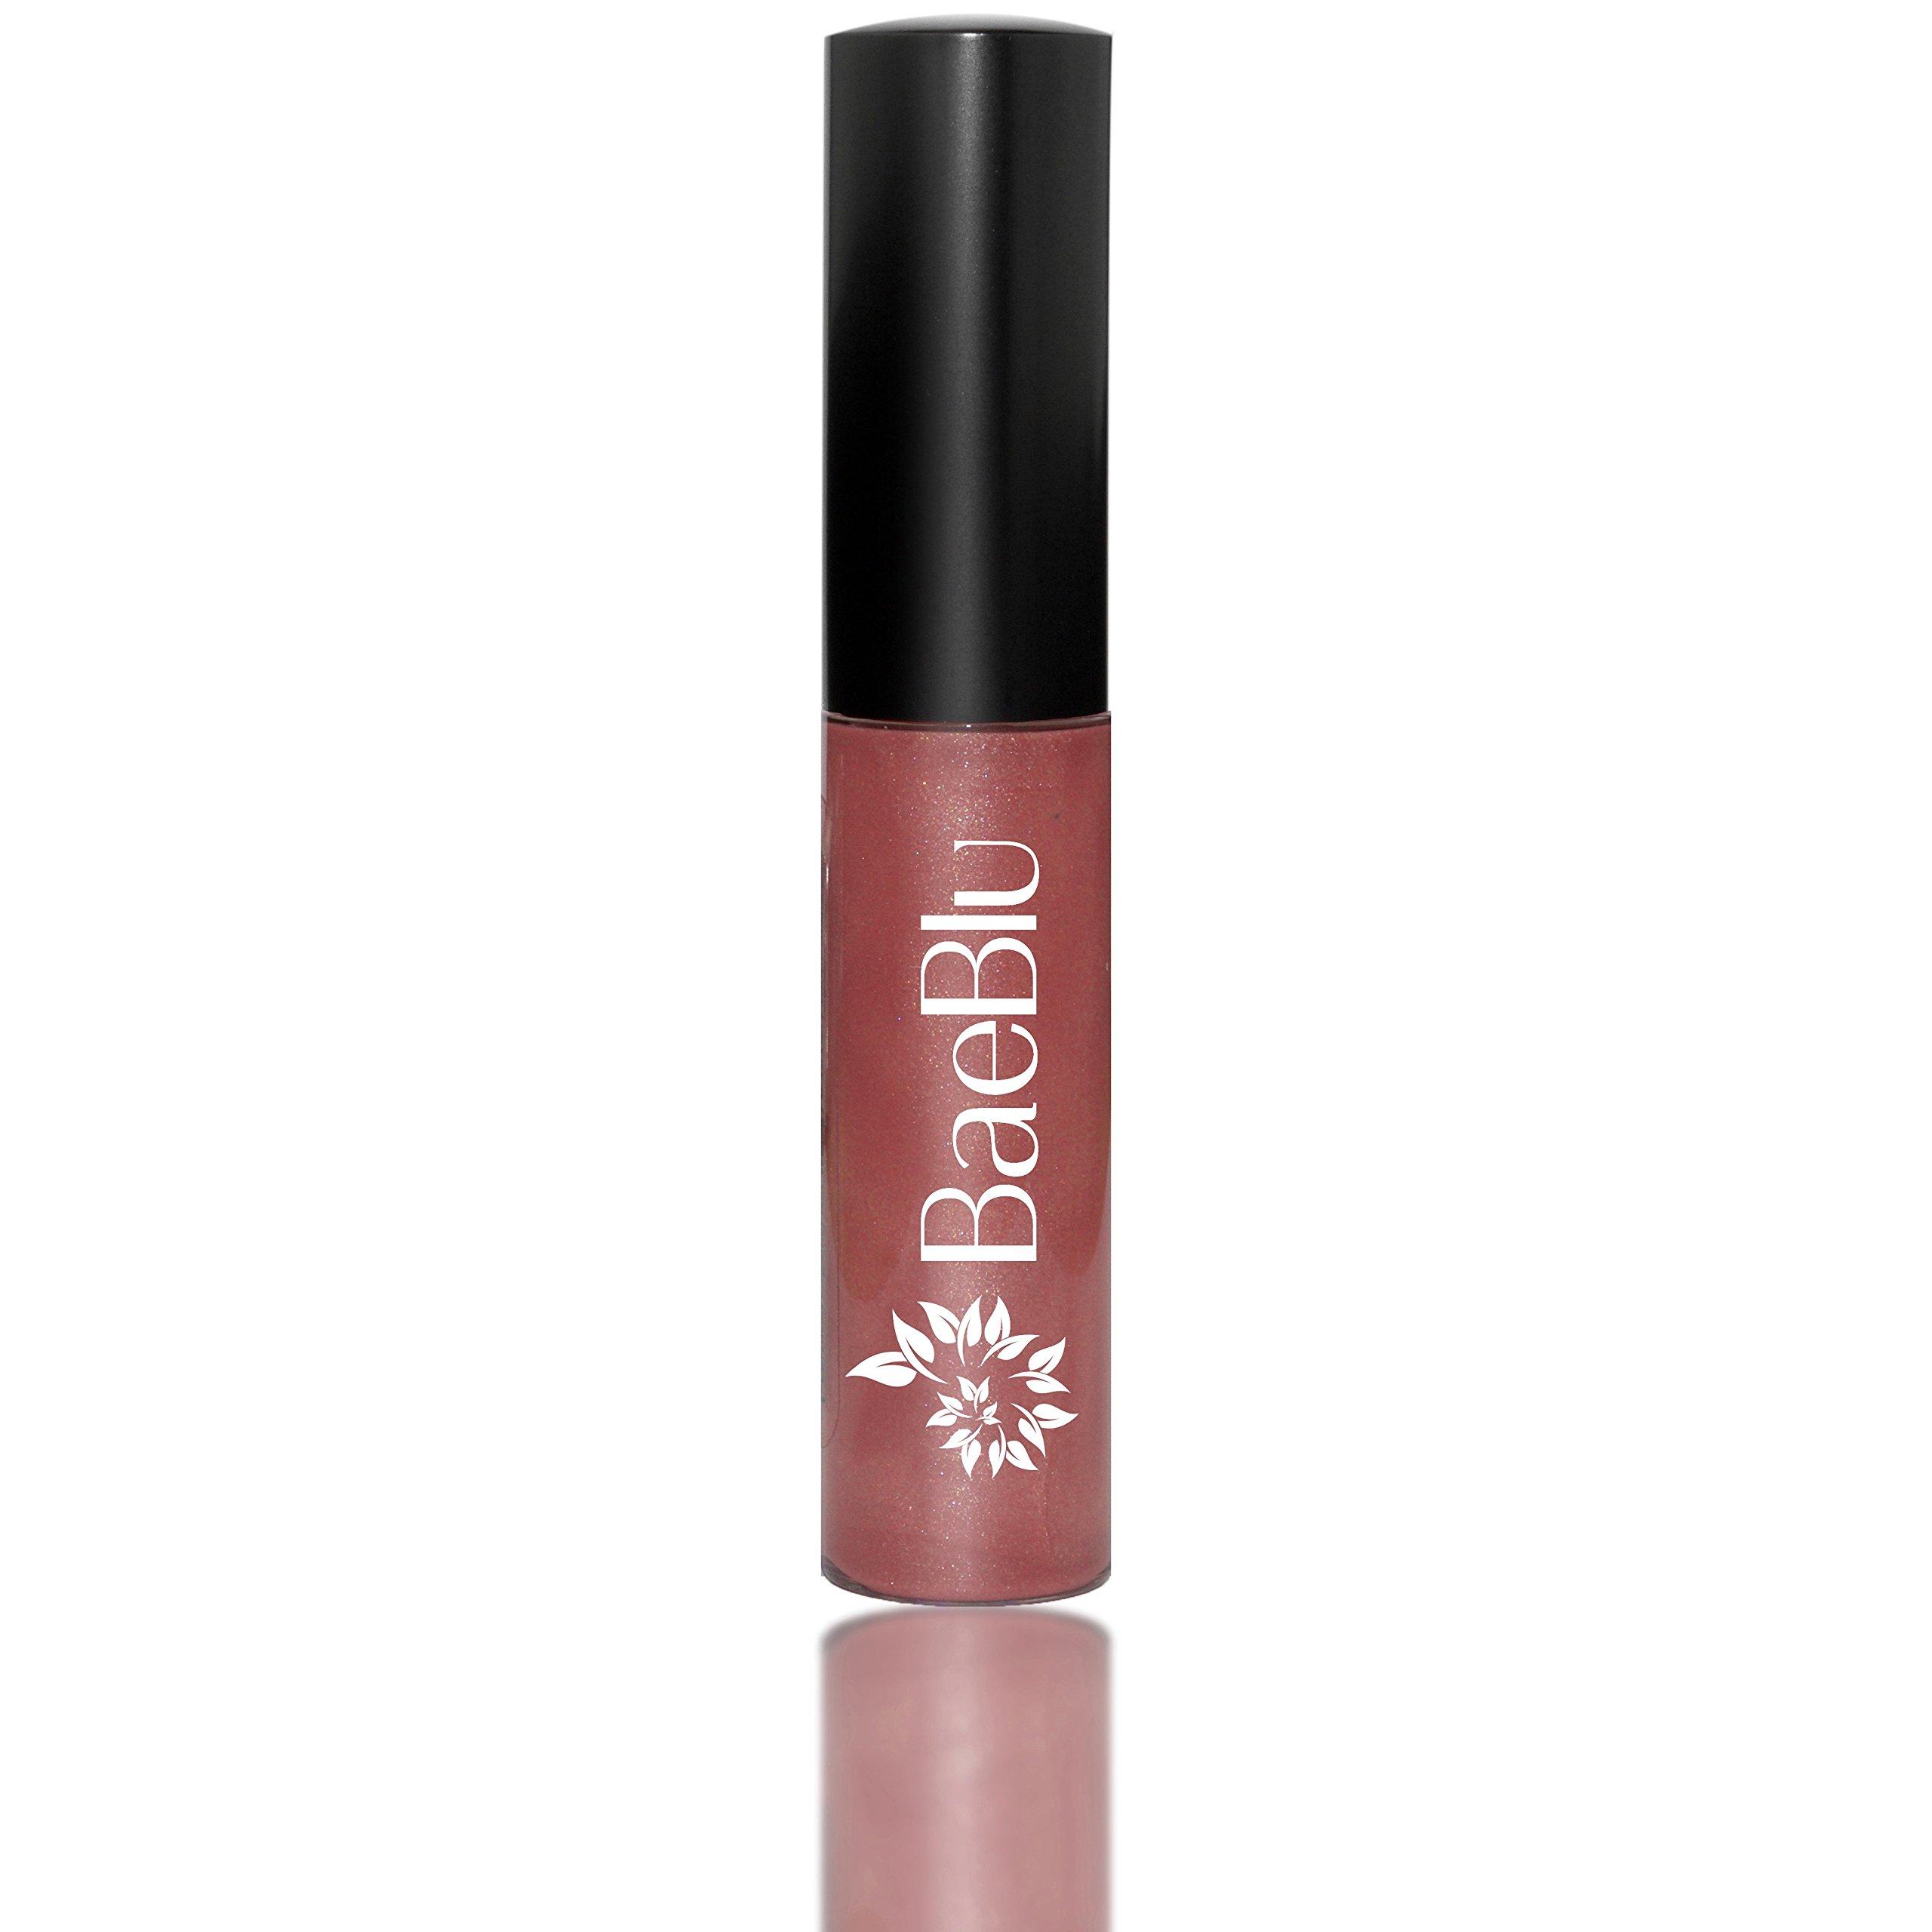 BaeBlu Organic Vegan Lip Gloss, 100% Natural Non-Toxic Moisturizing Ingredients, What a Babe